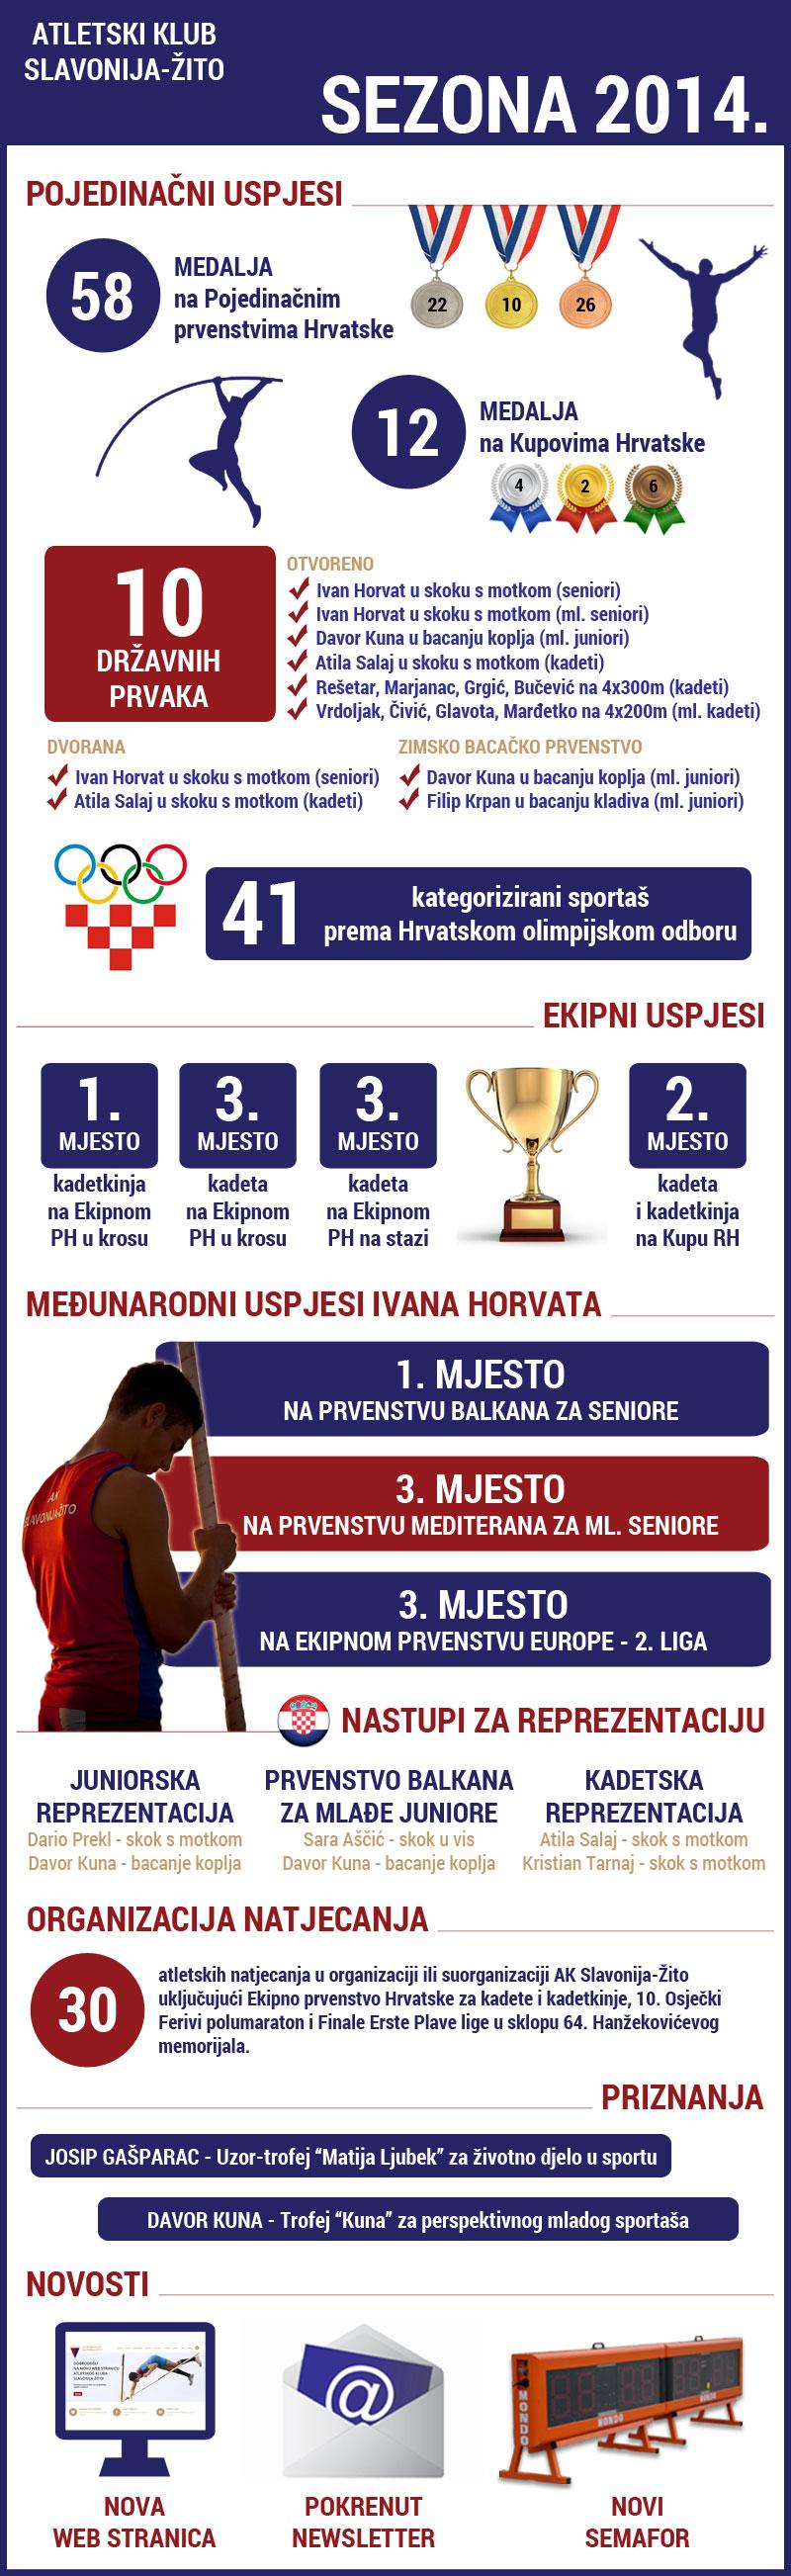 Infografika-sezona-2014